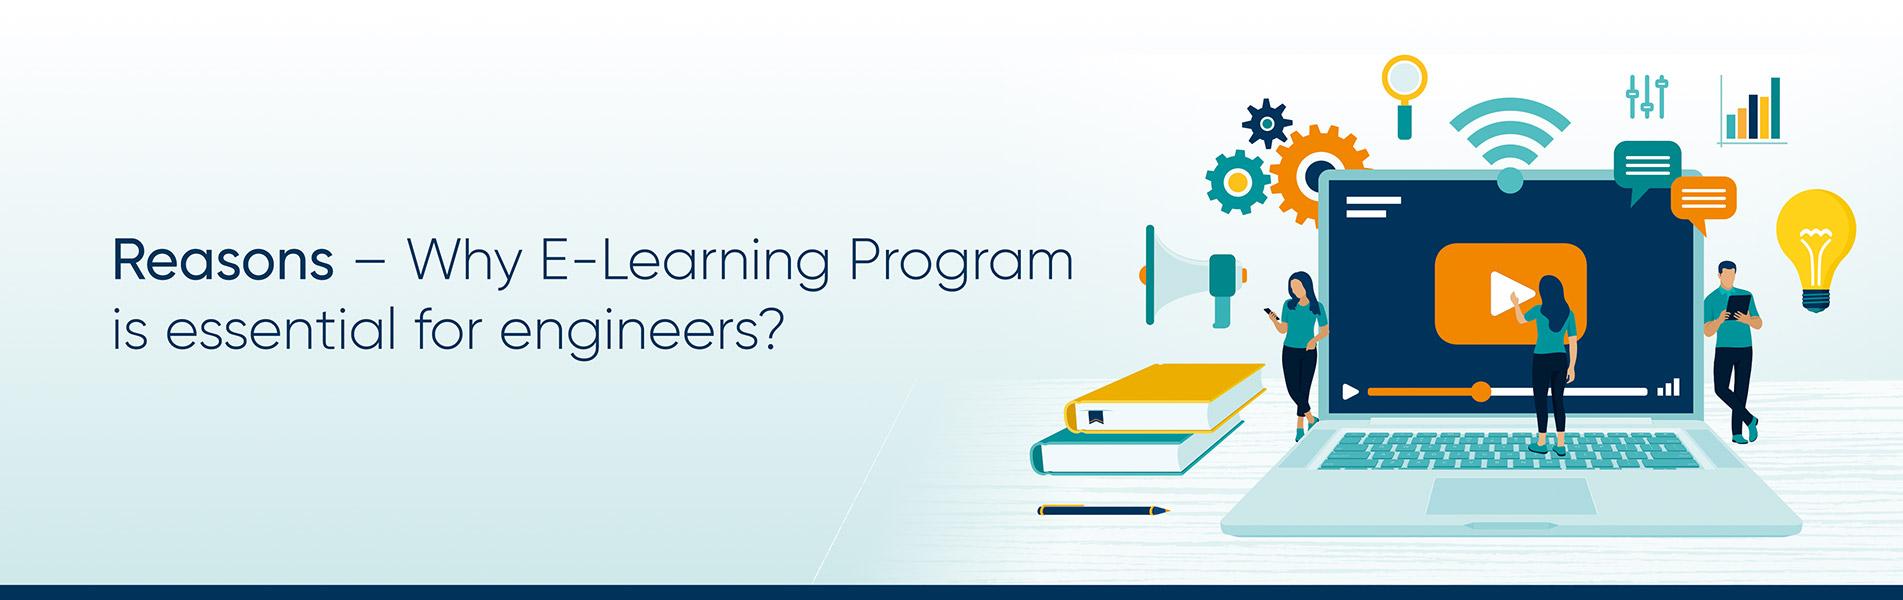 e-Learning program, engineers